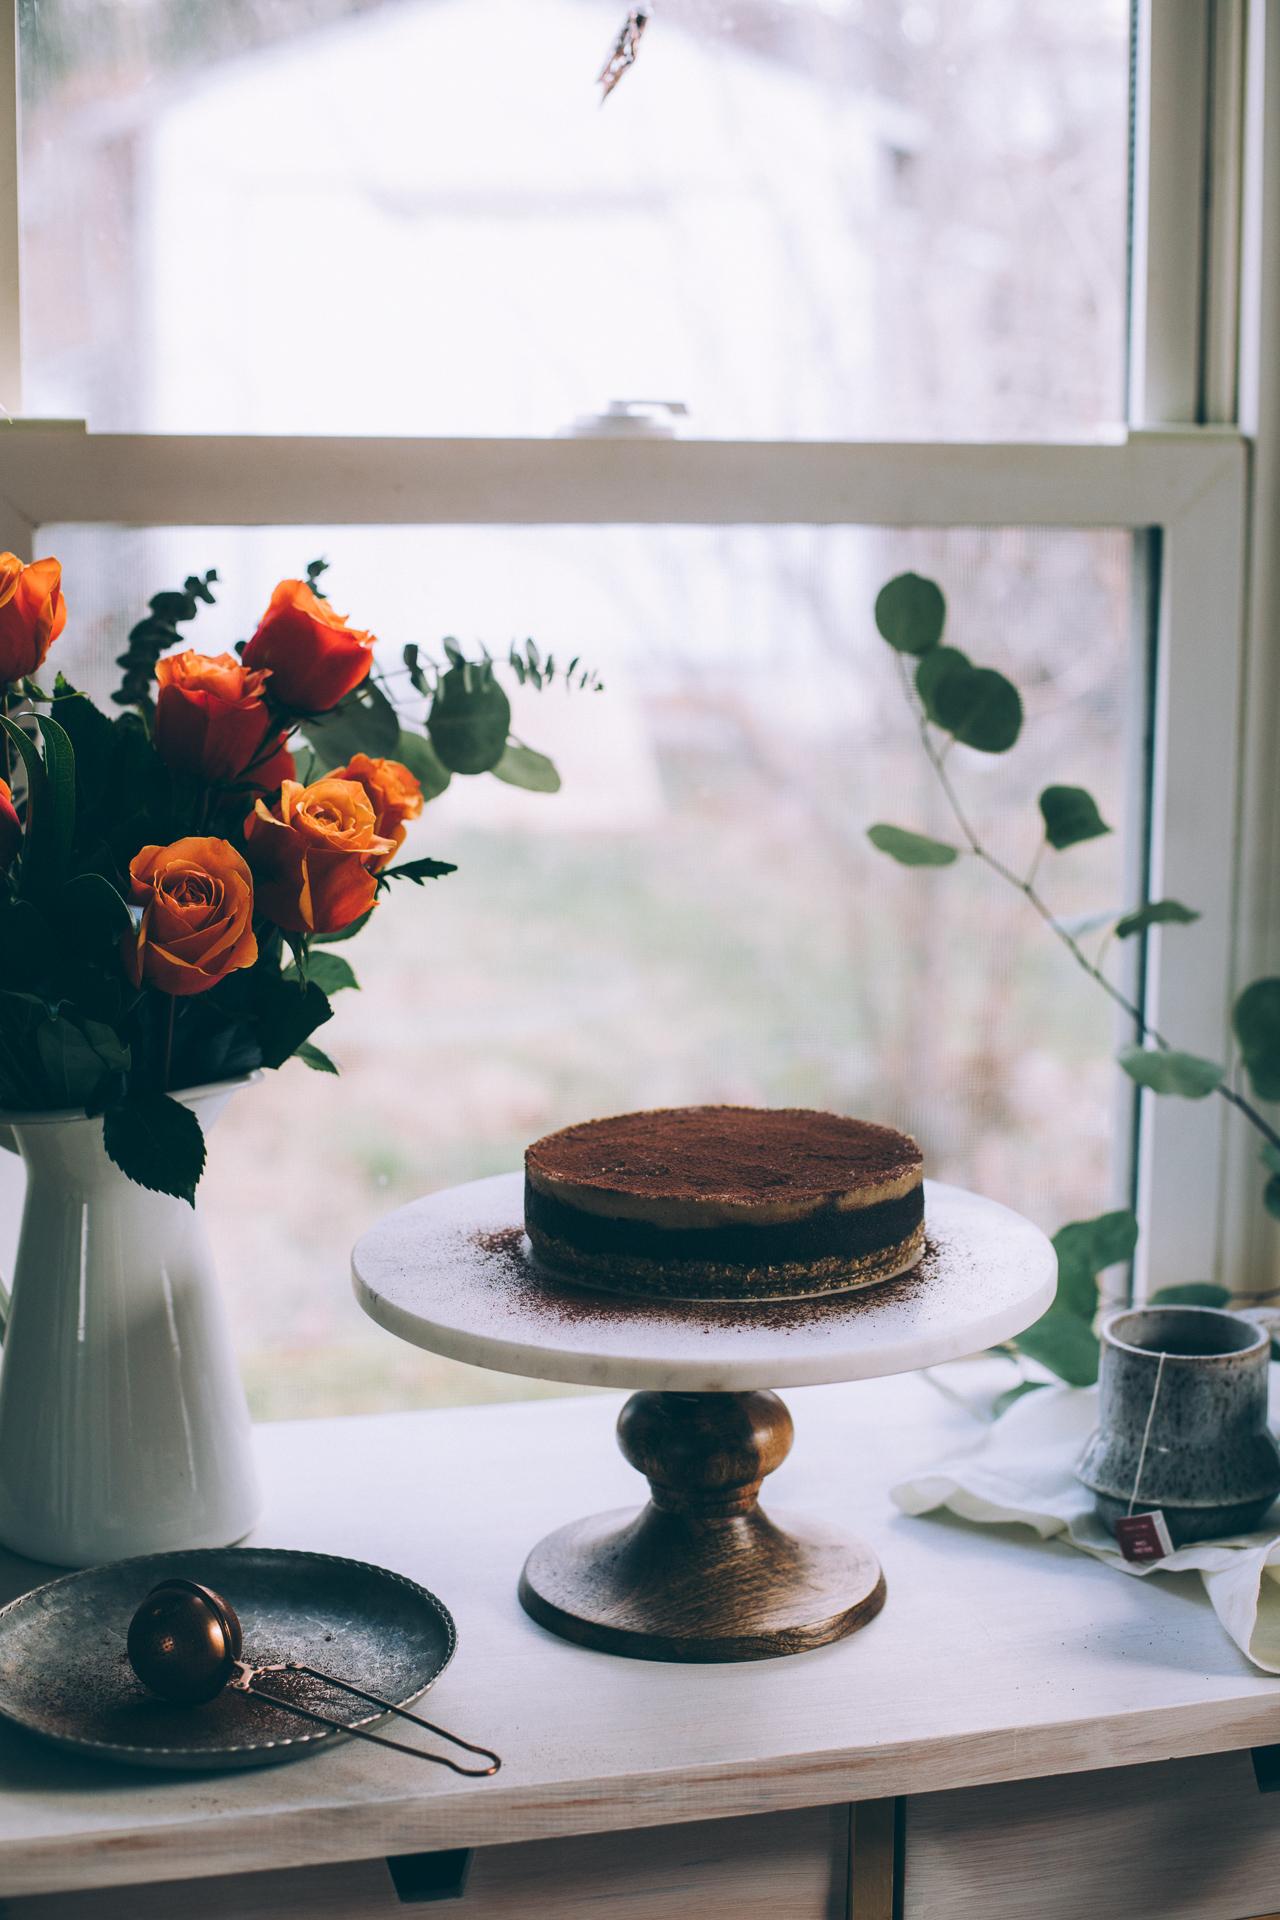 raw-vegan-chocolate-cashew-caramel-cake-7088.jpg